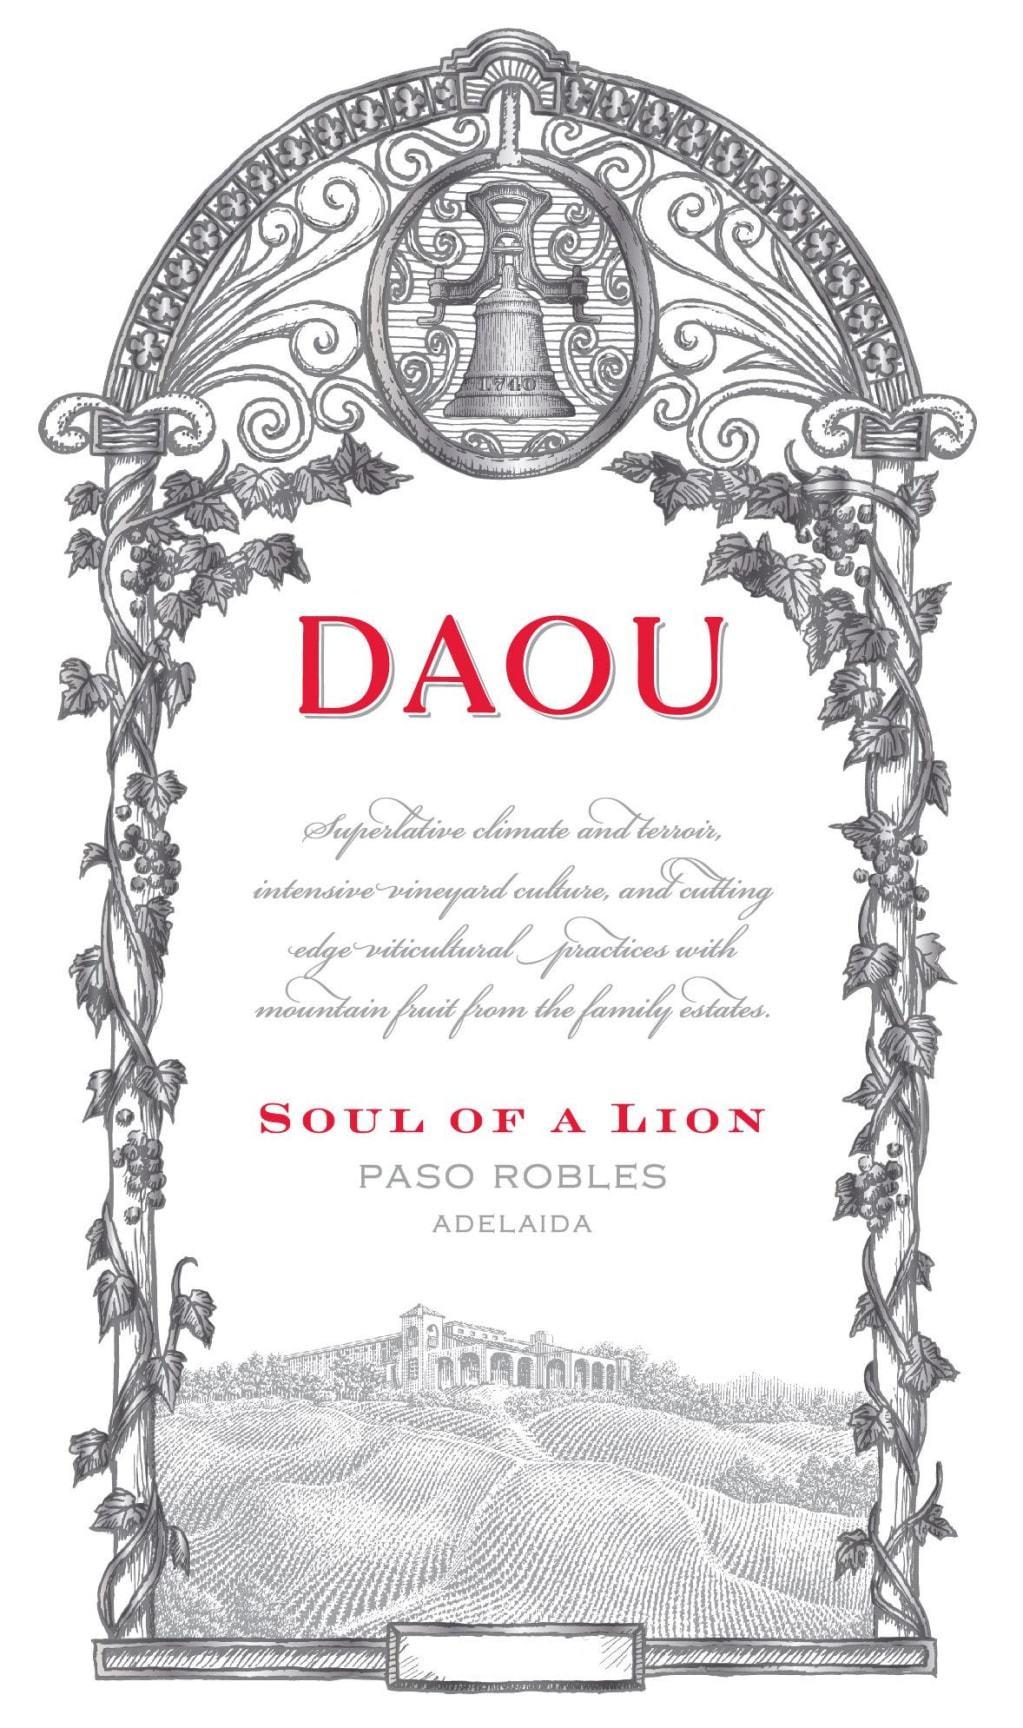 Daou Soul Of Alion